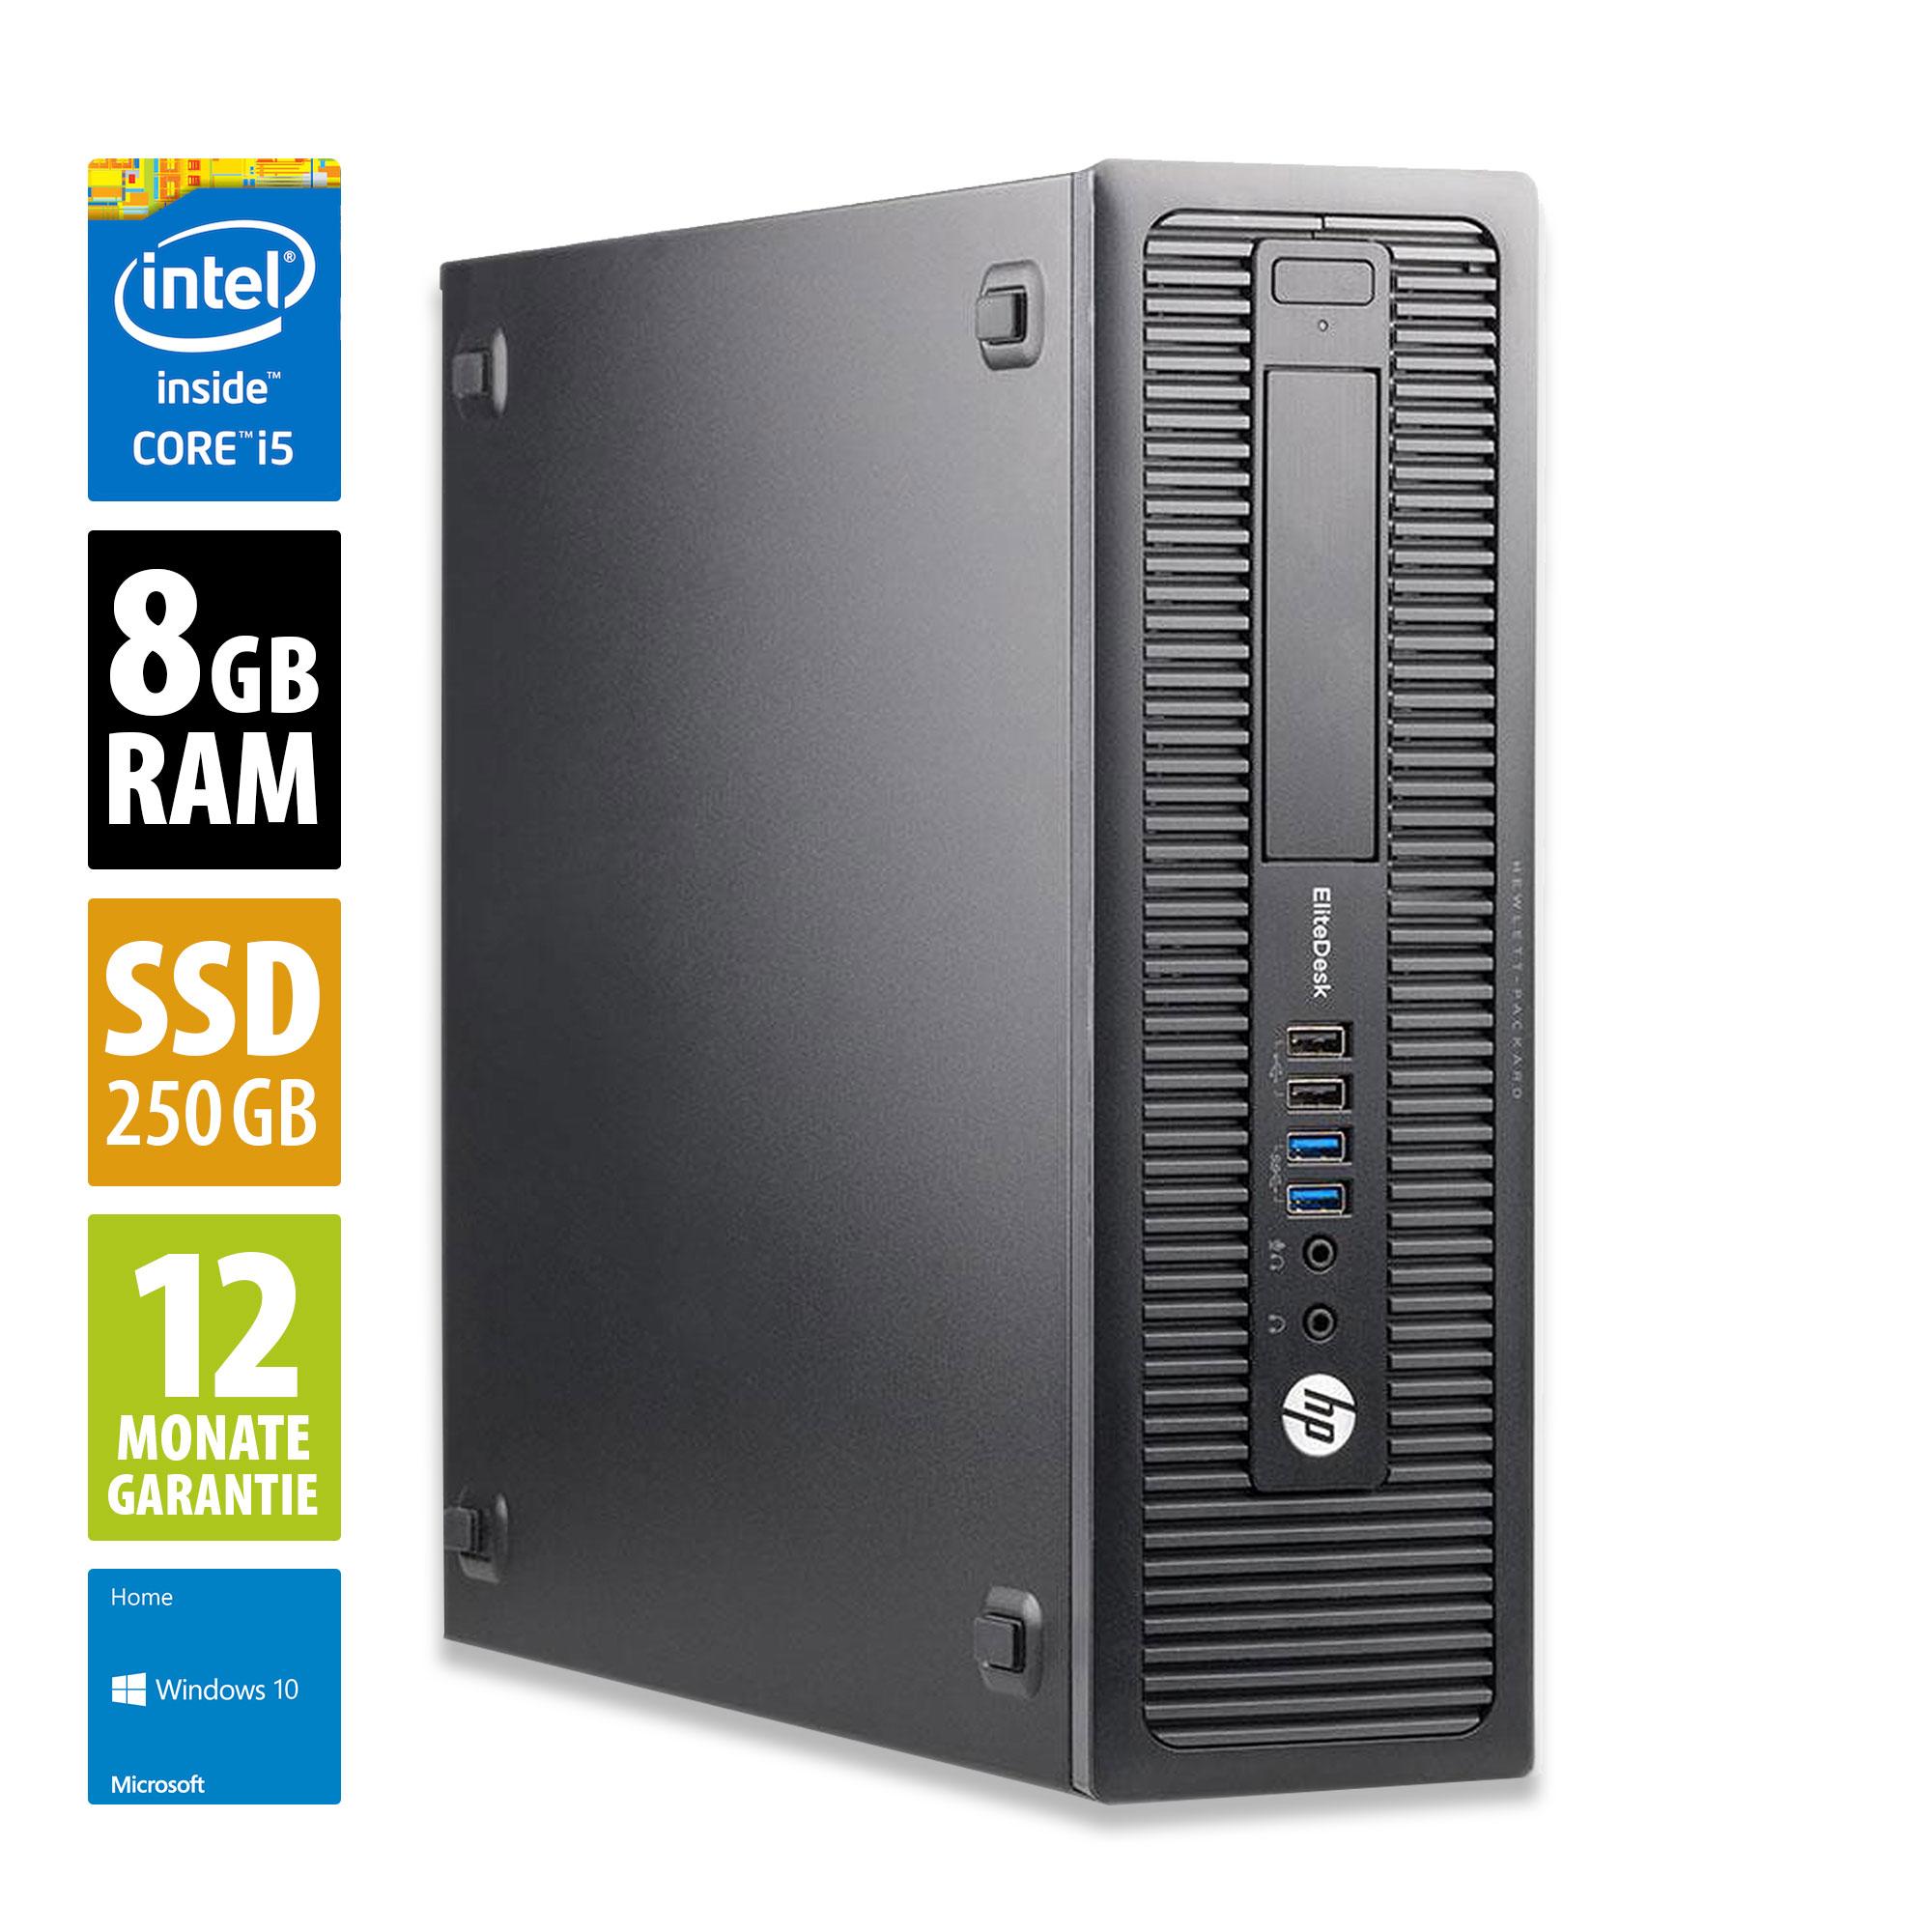 HP EliteDesk 800 G1 SFF - Core i5-4570 @ 3,2 GHz - 8GB RAM - 250GB SSD - Win10Home